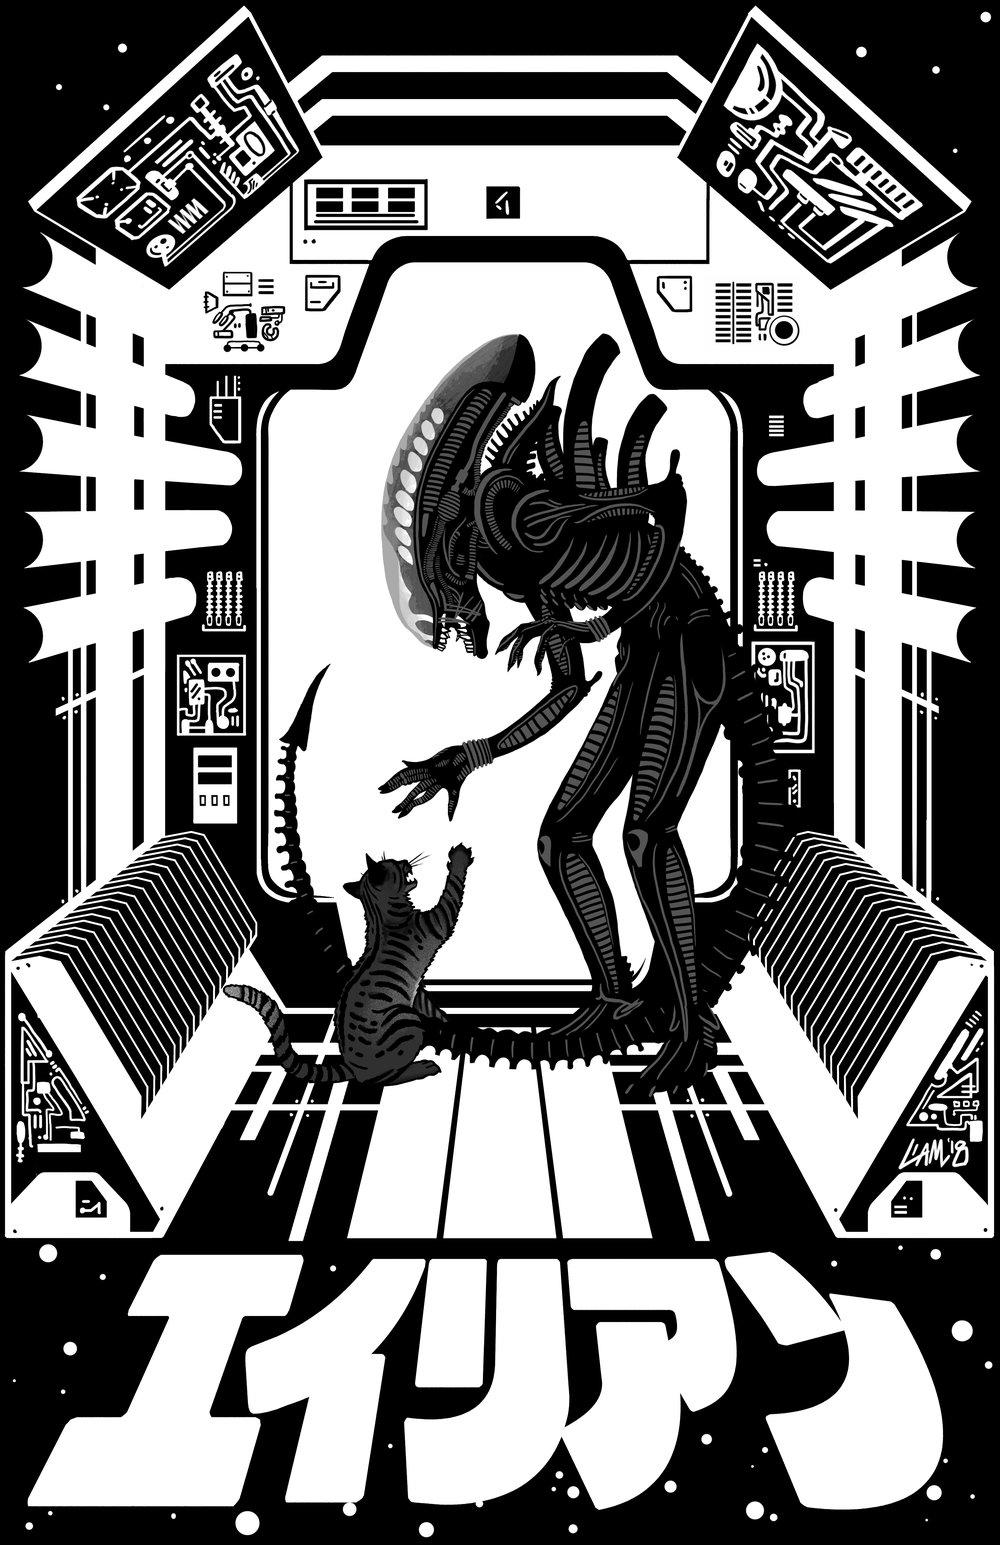 alien_02_shirtsize_v4_BandW2.jpg